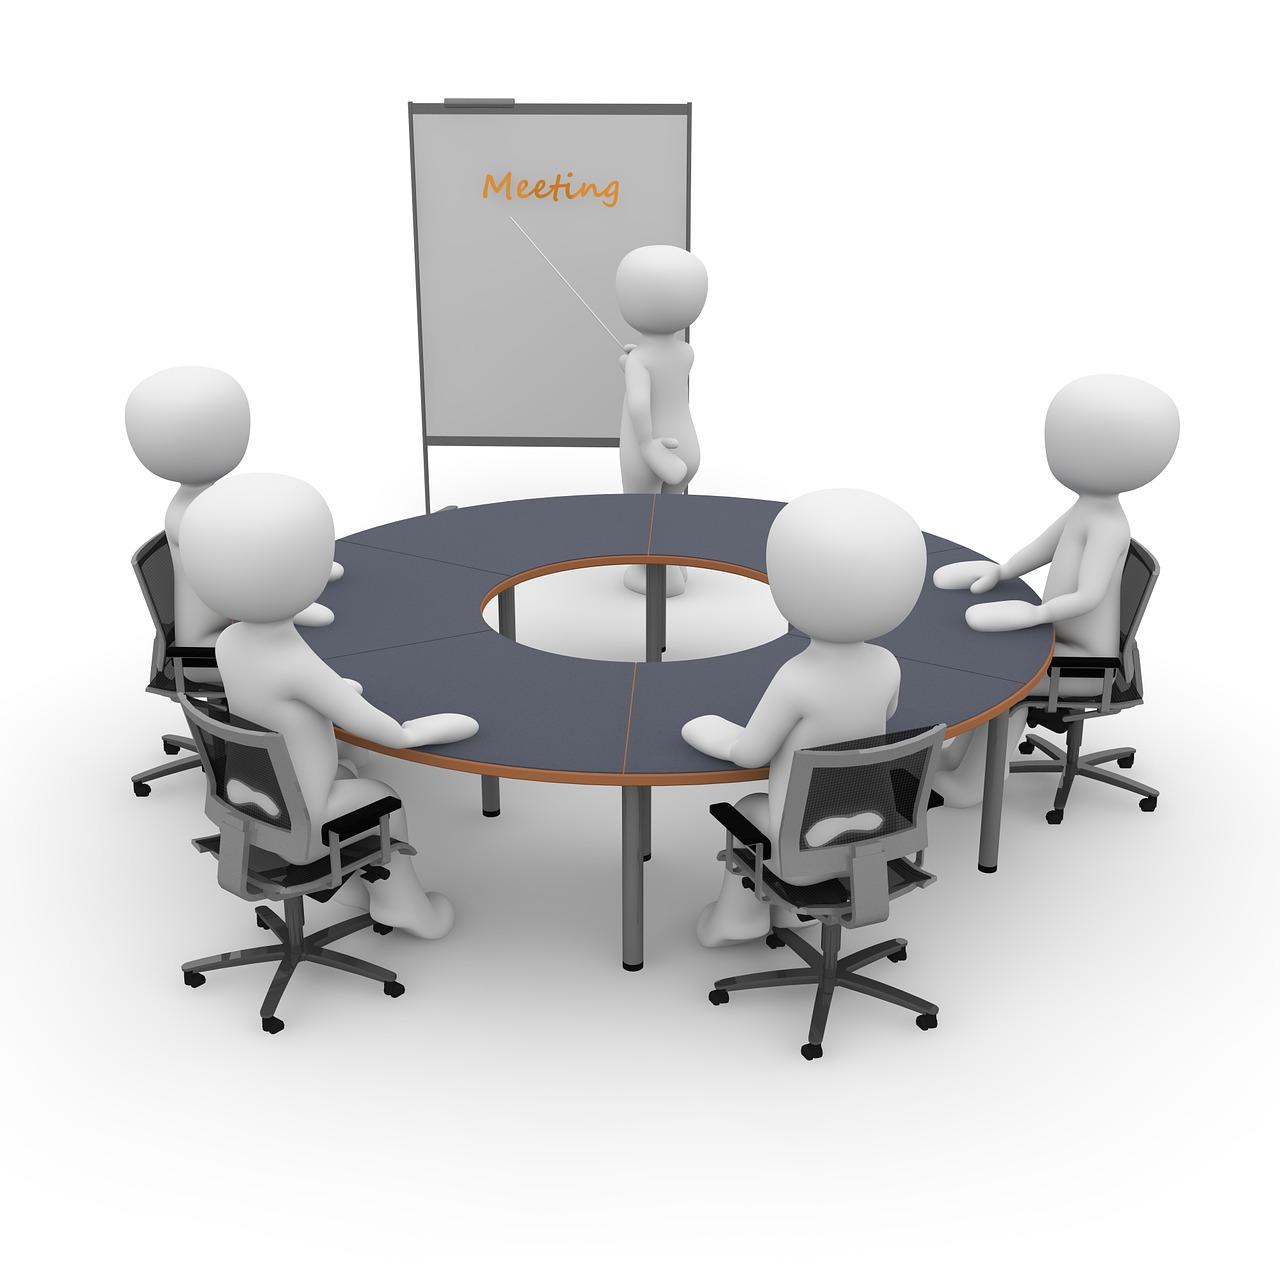 meeting, collaboration, meet-1015590.jpg